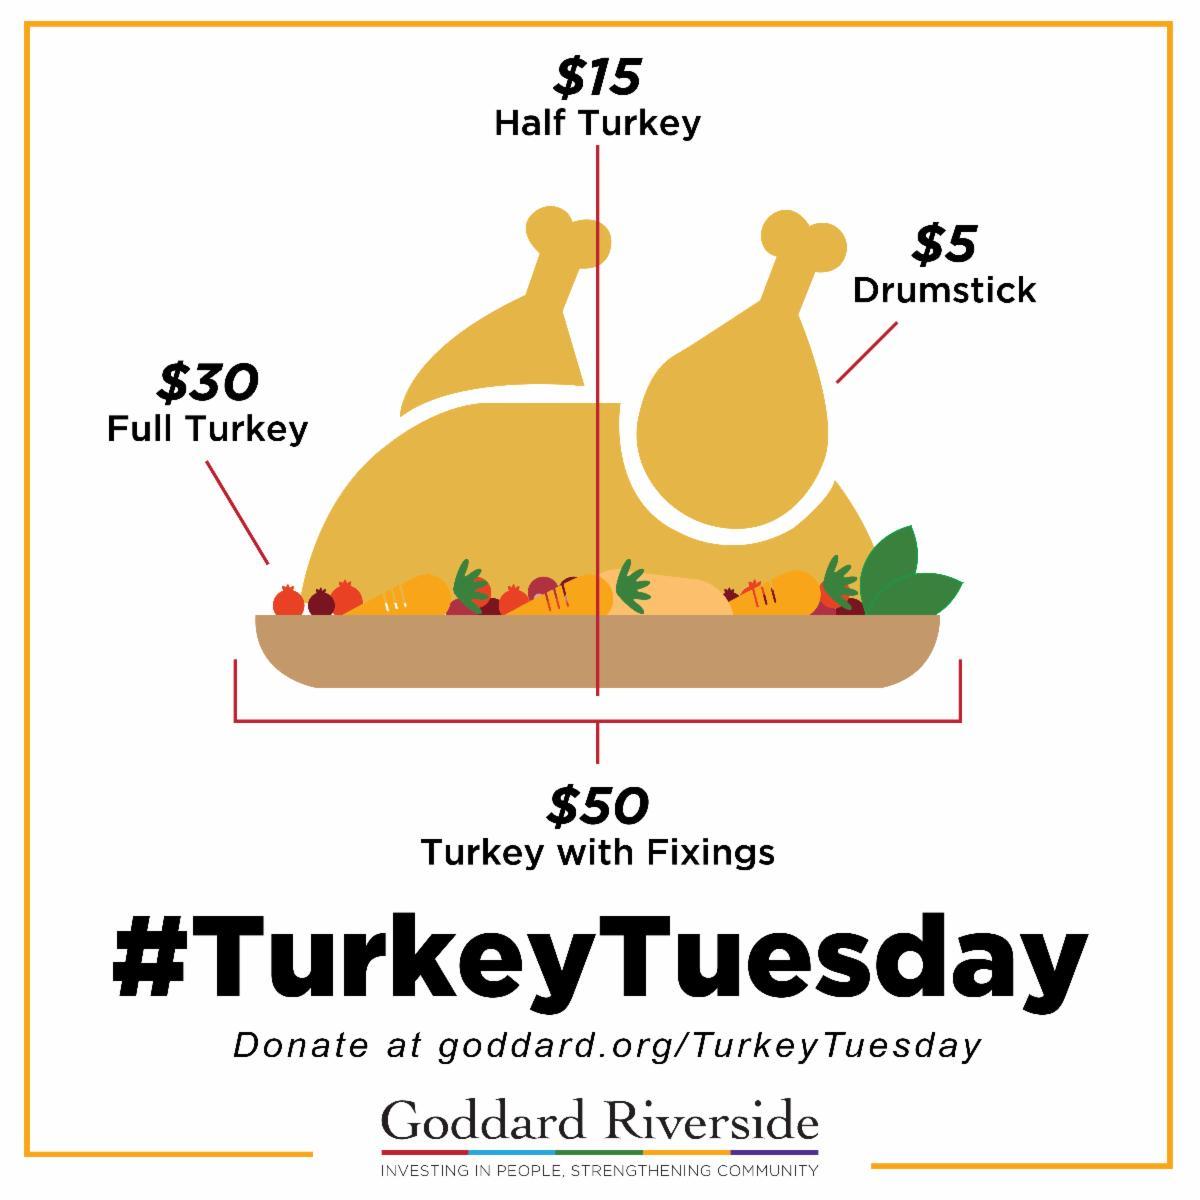 Support Turkey Tuesday at goddard.org/TurkeyTuesday